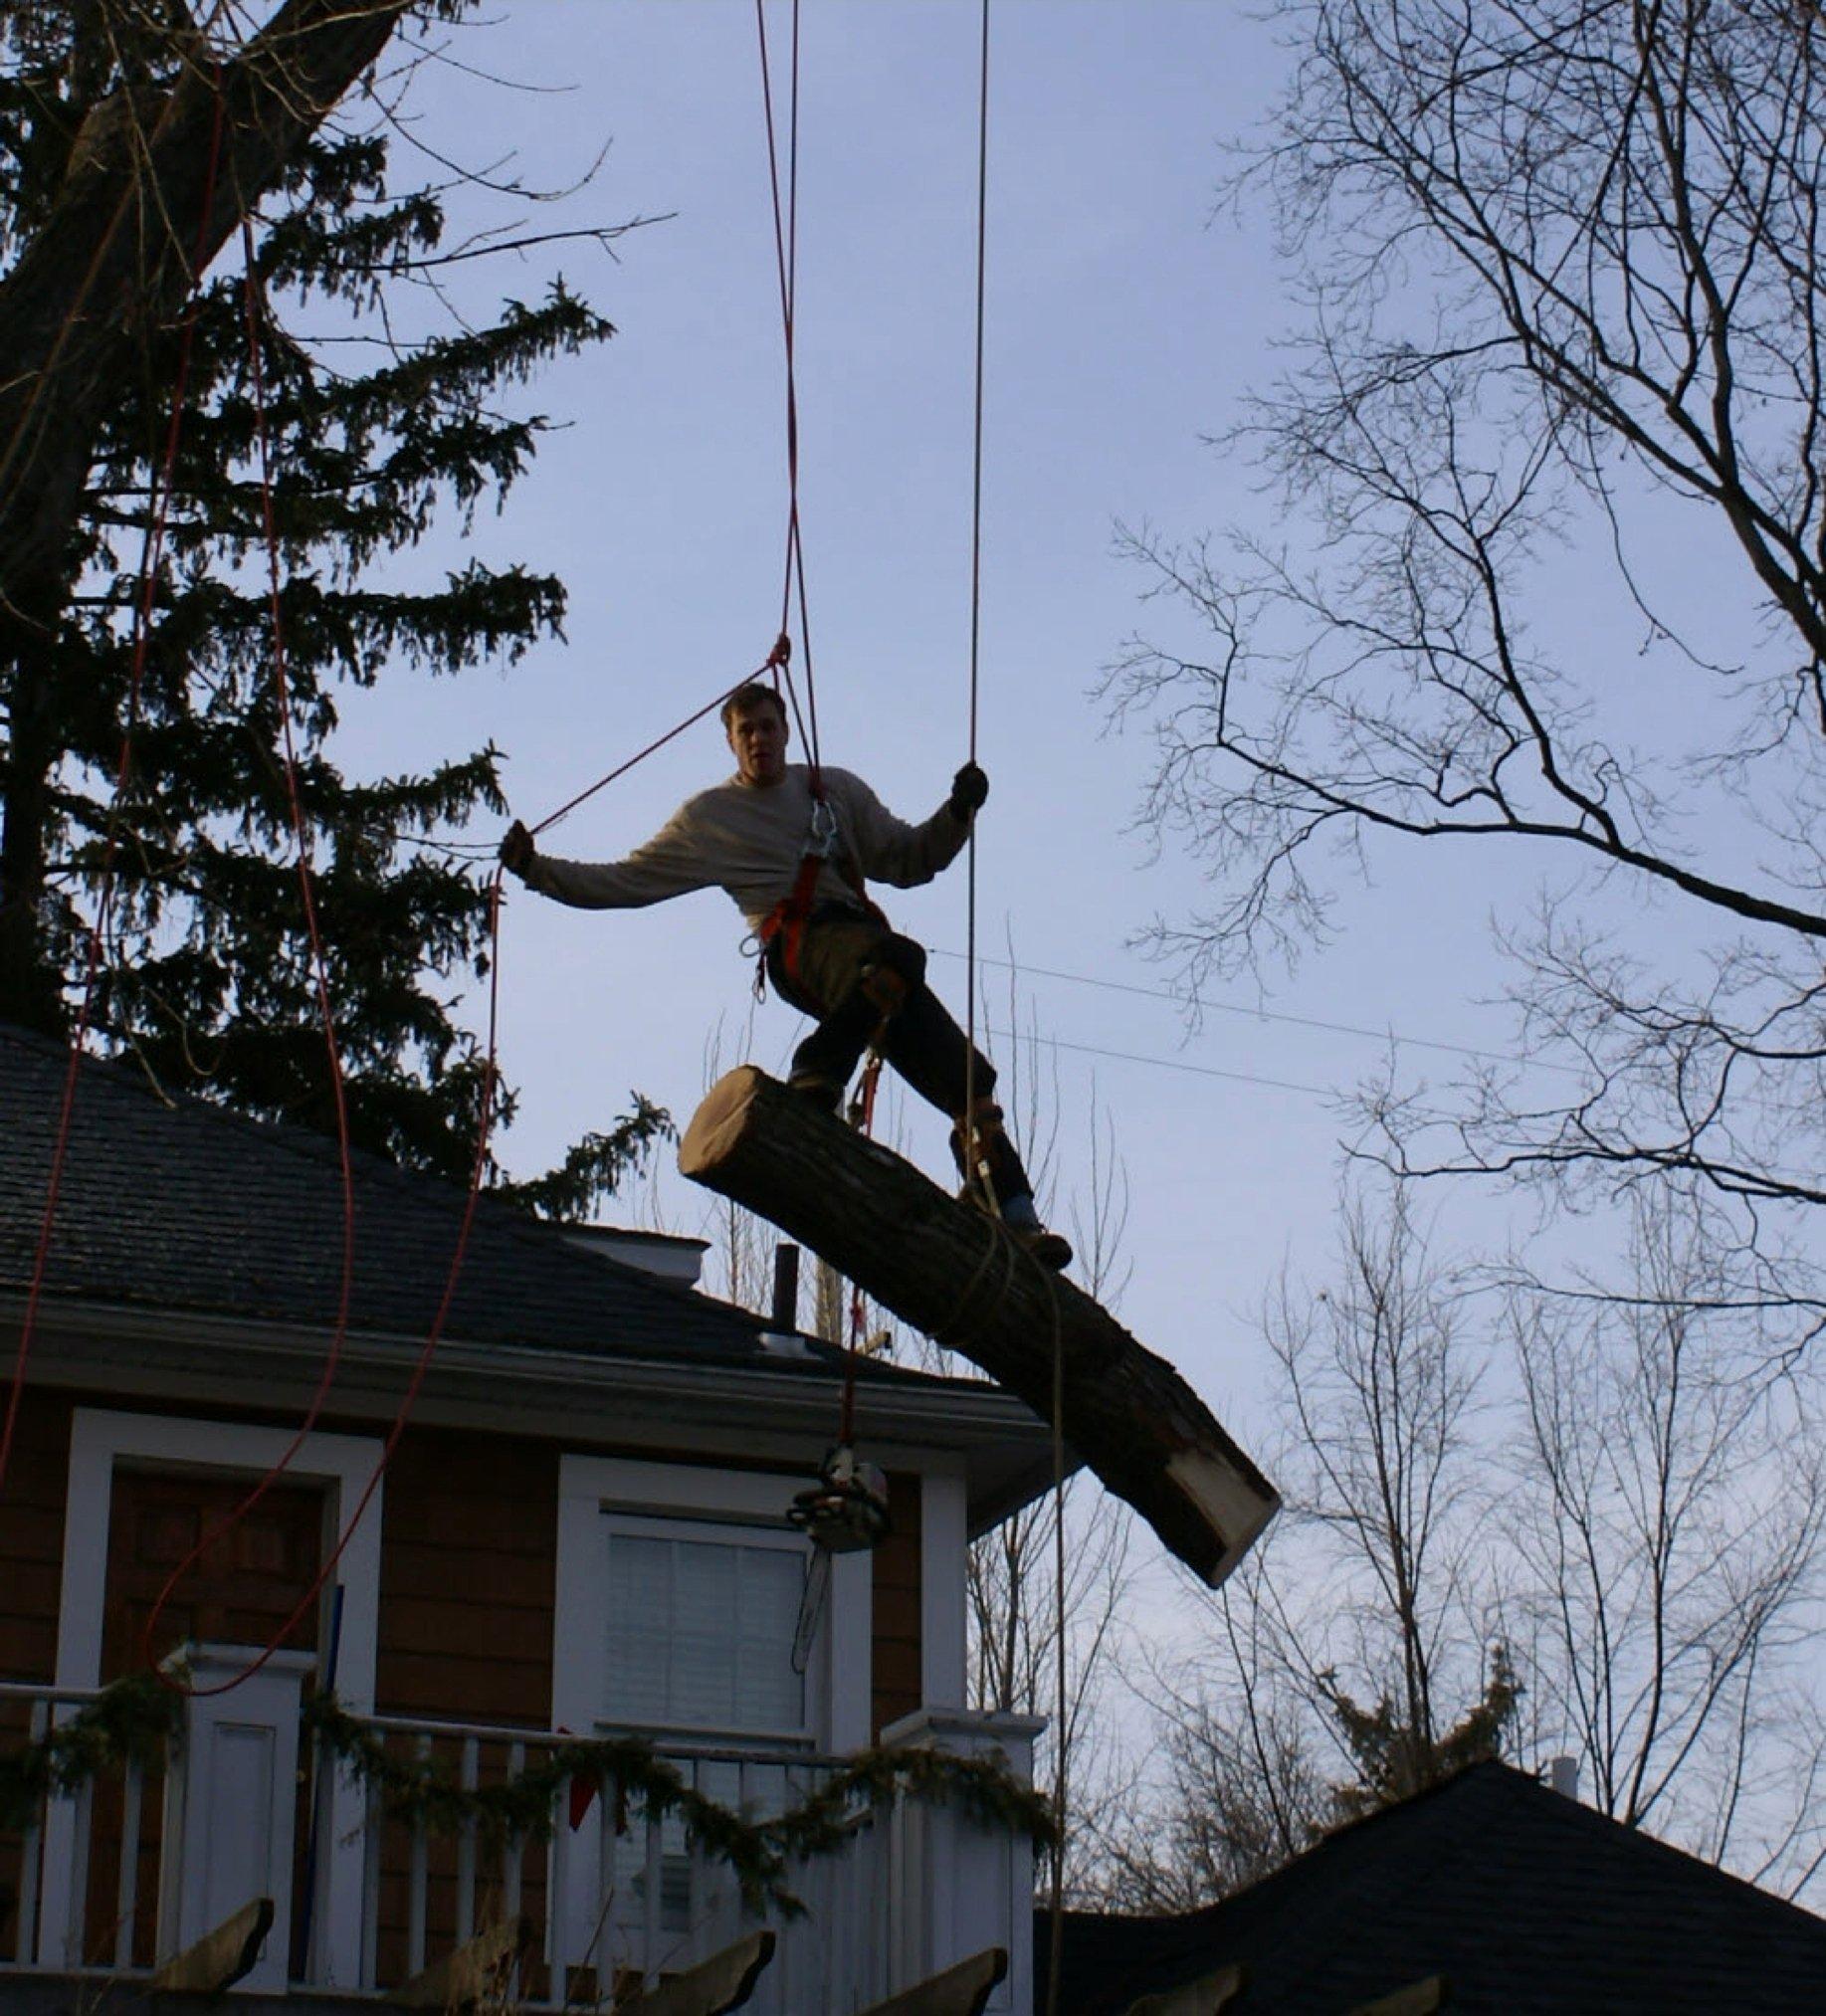 Tree Trimming Estimate Template Best Of Royal Oak Michigan Tree Service